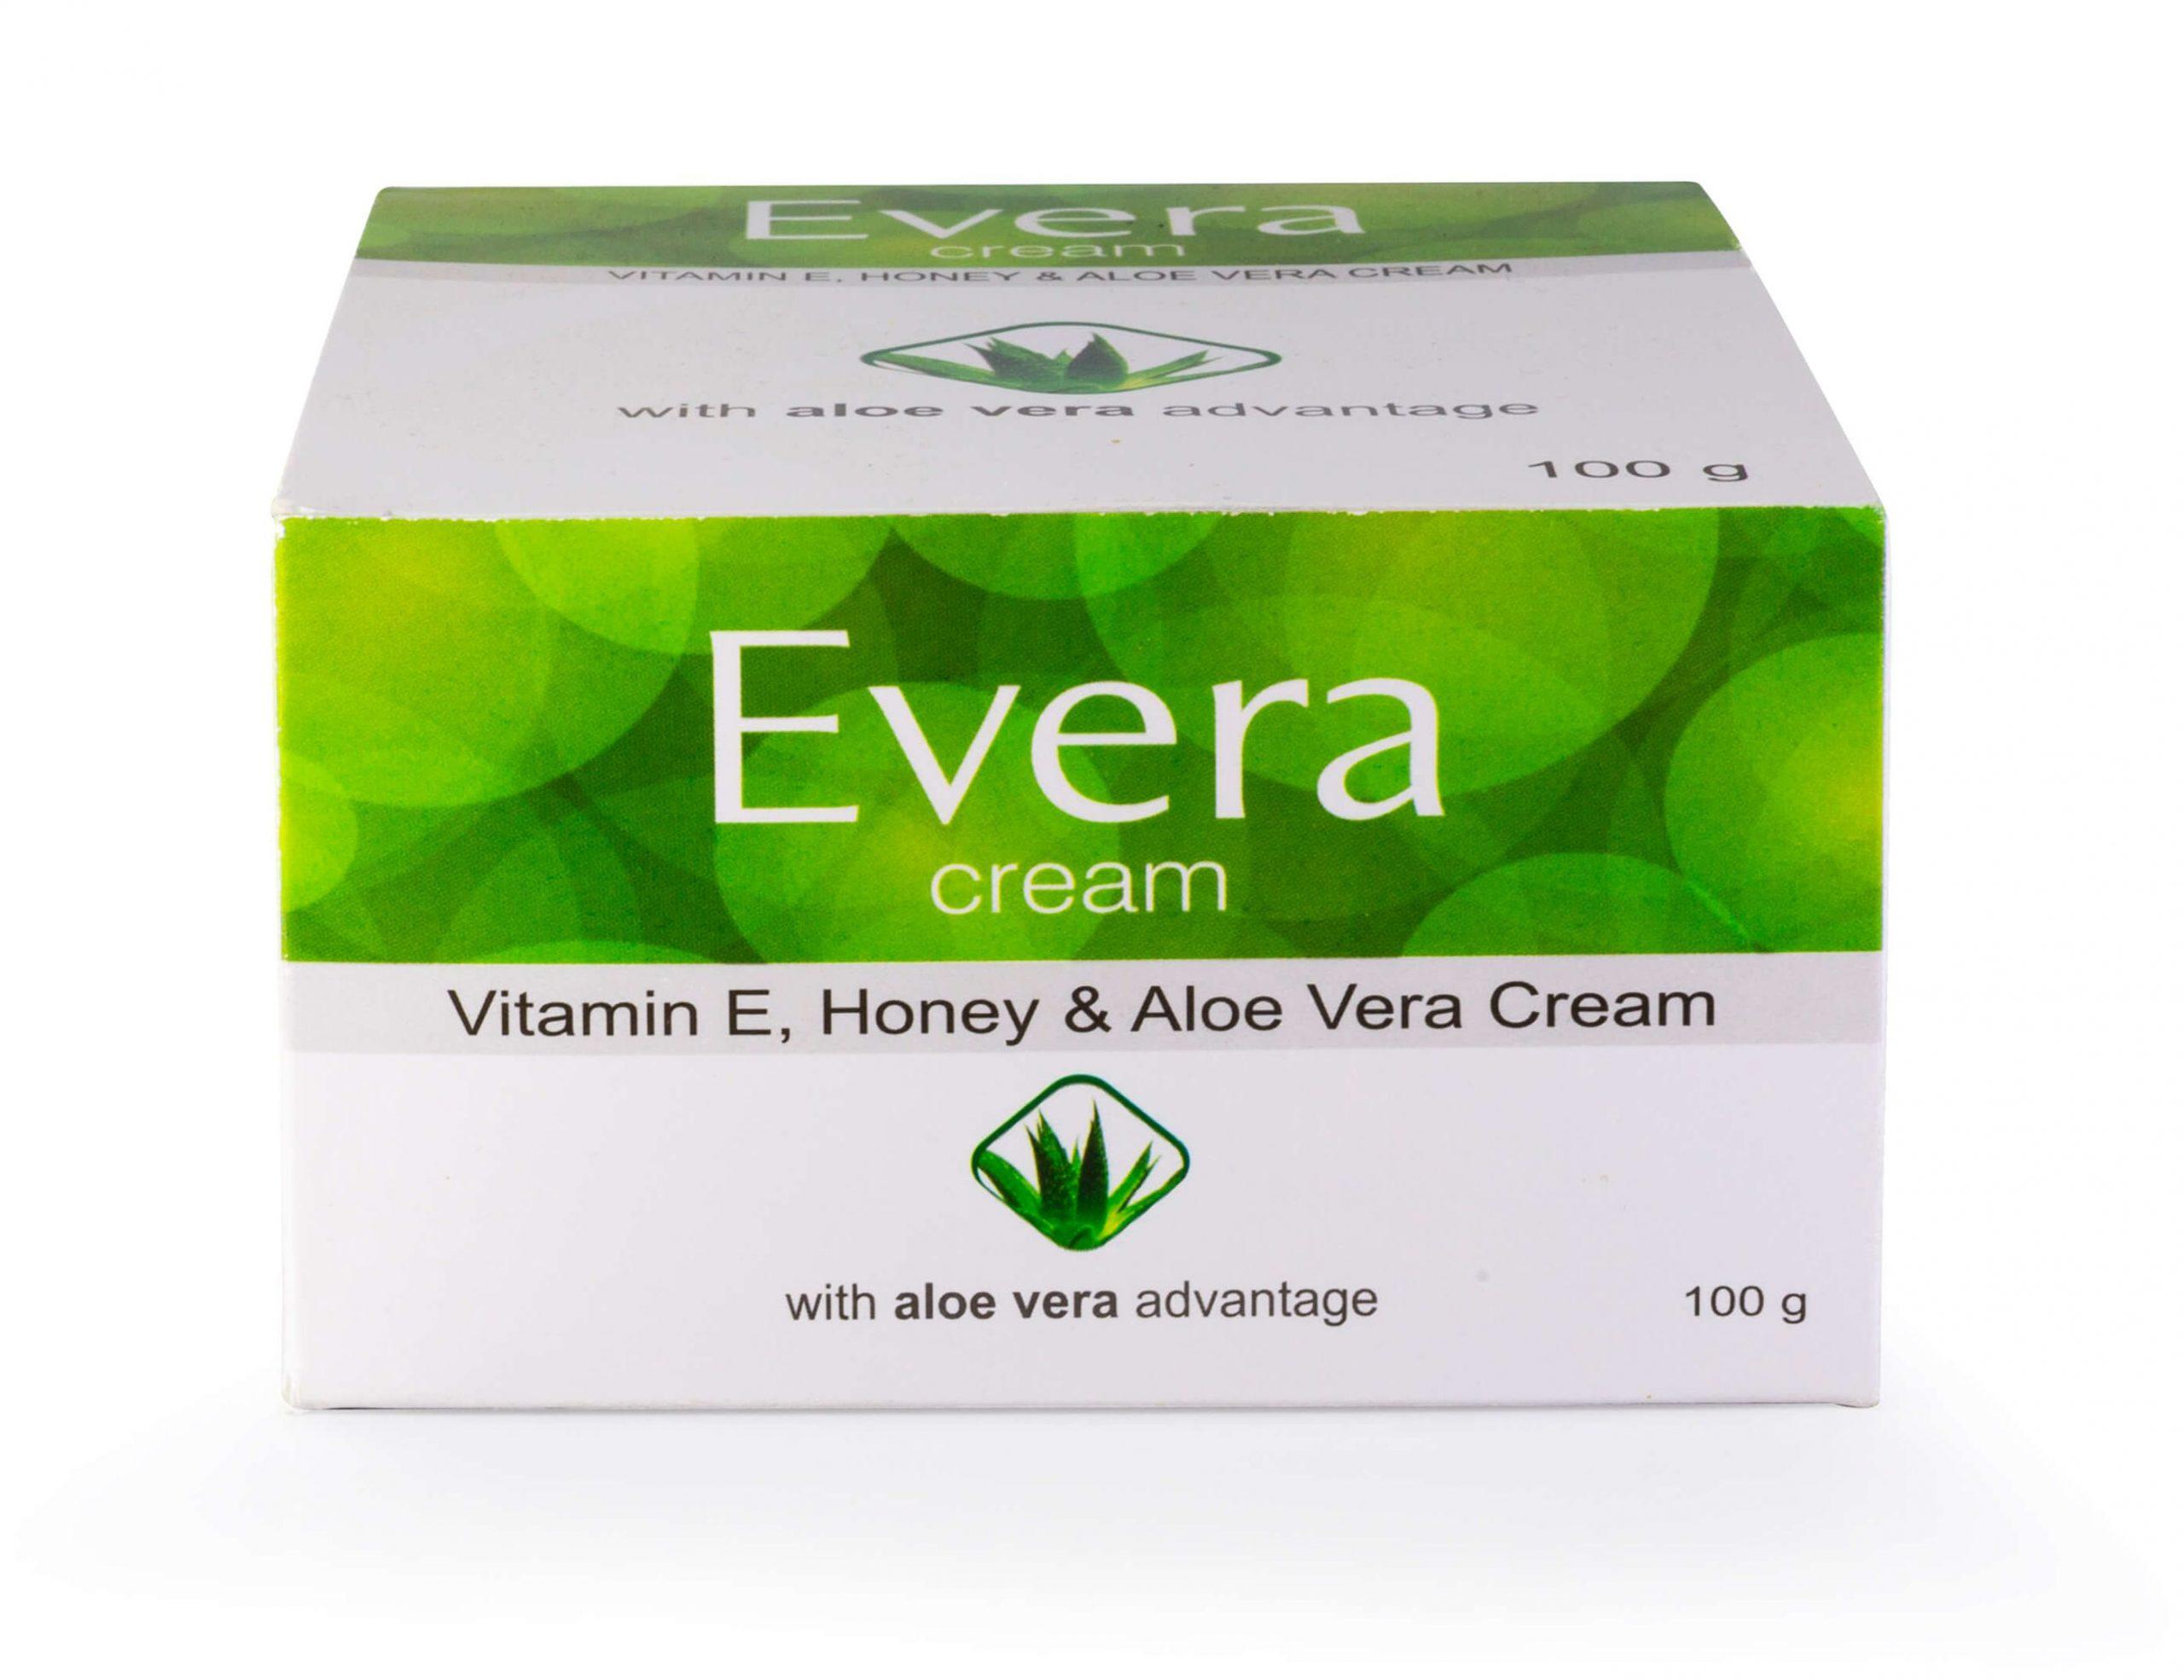 Evera Cream